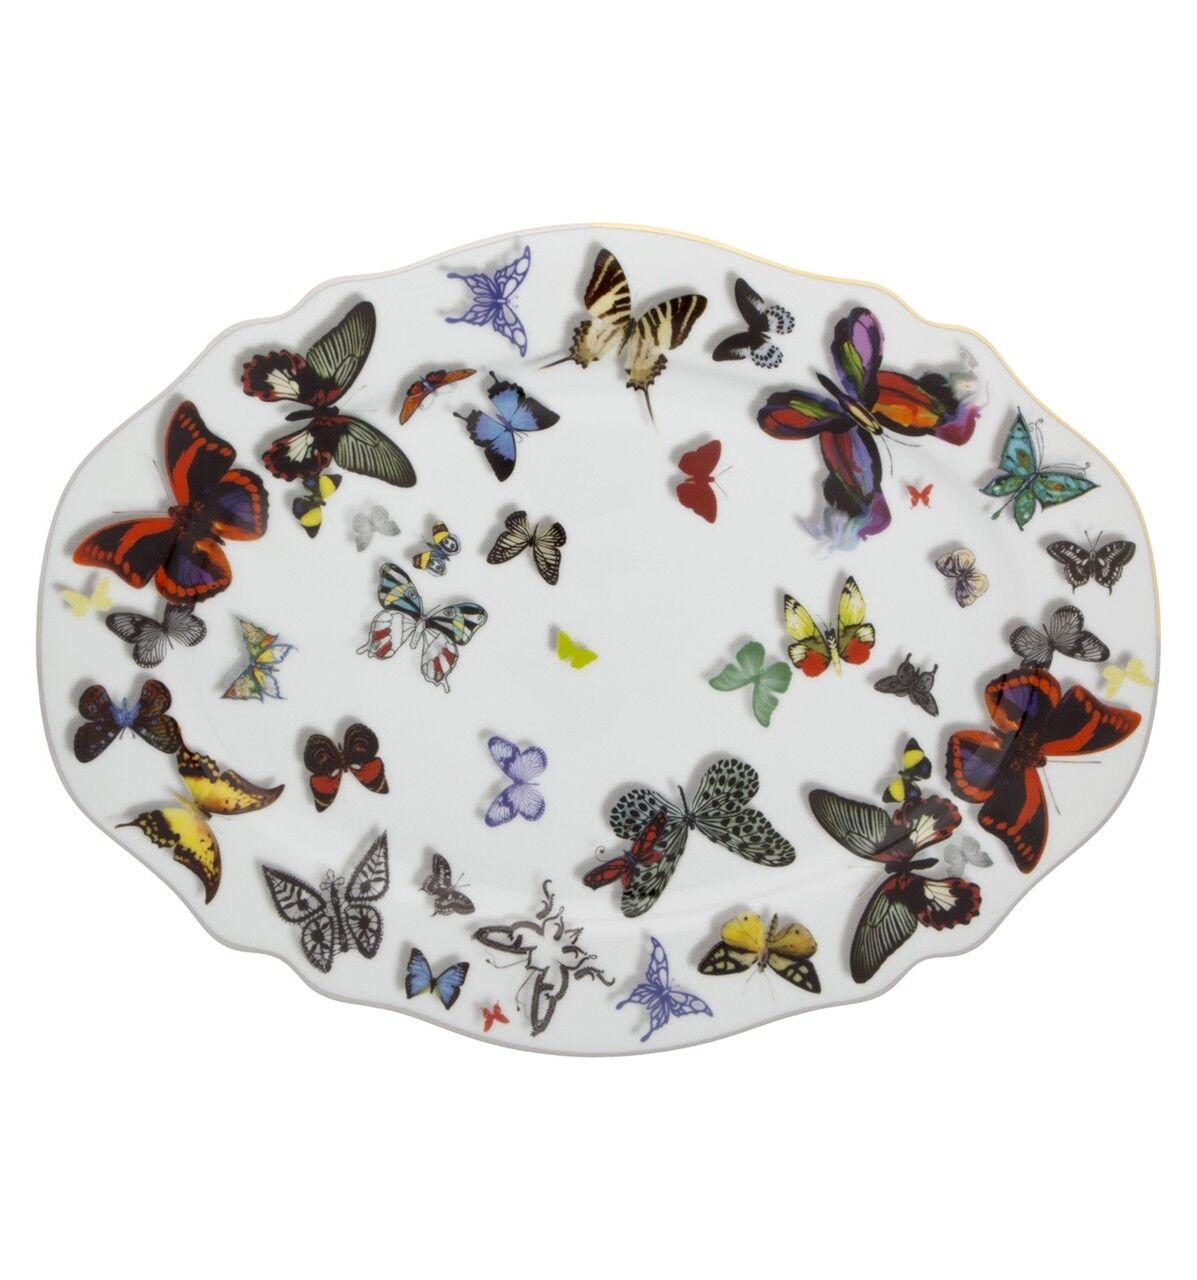 Vista Alegre Papillon Parade Petit Plateau Ovale - Set de 2